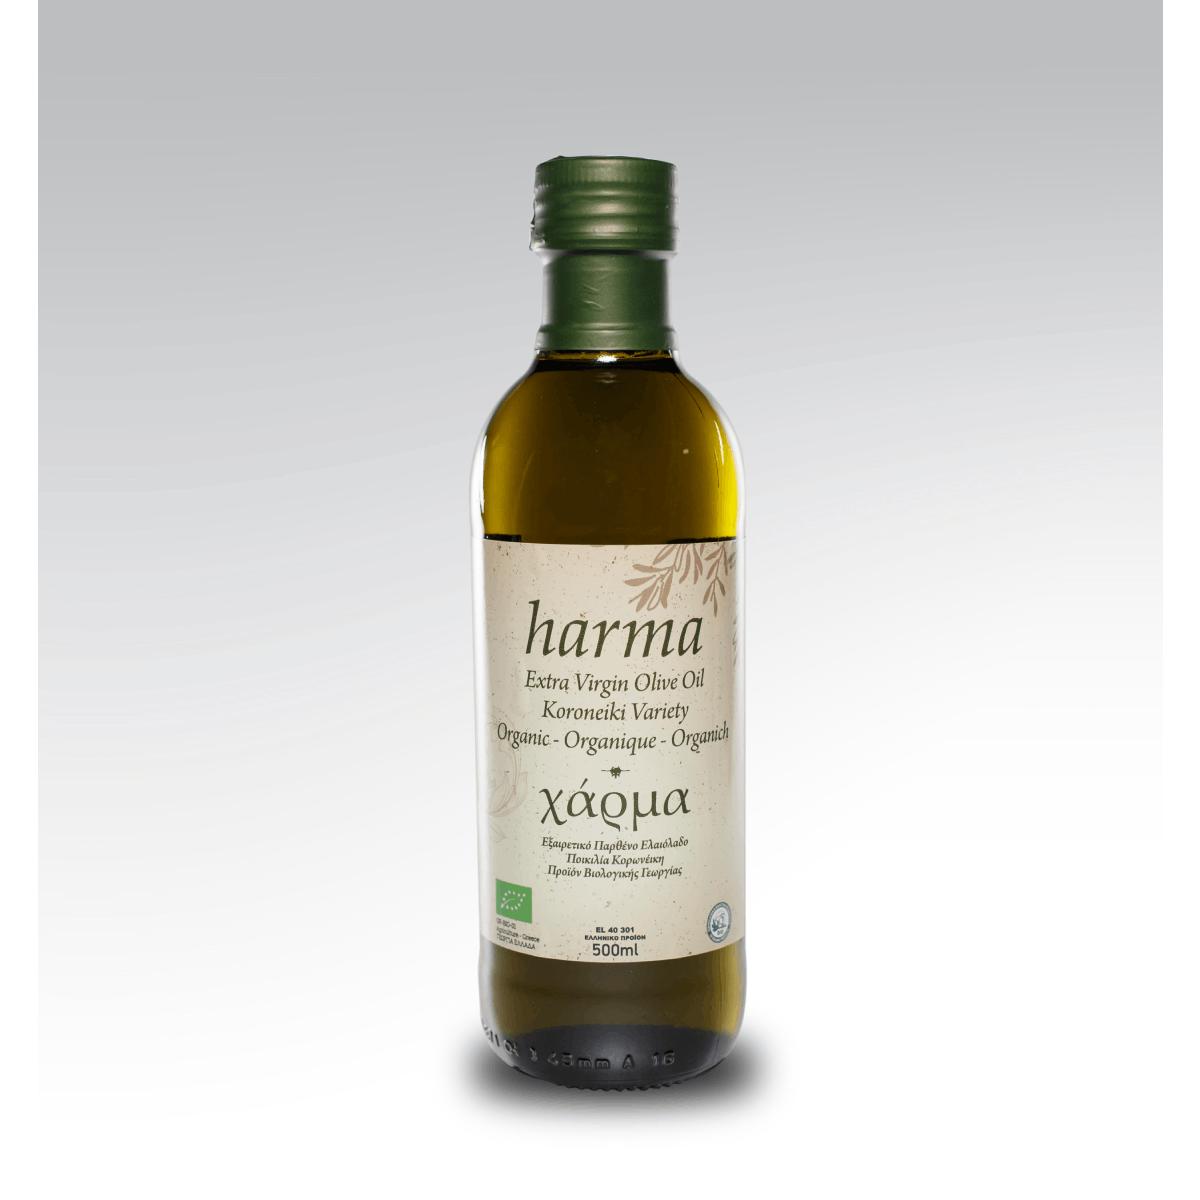 HARMA BIO 500ml – Organic Extra Virgin Olive Oil